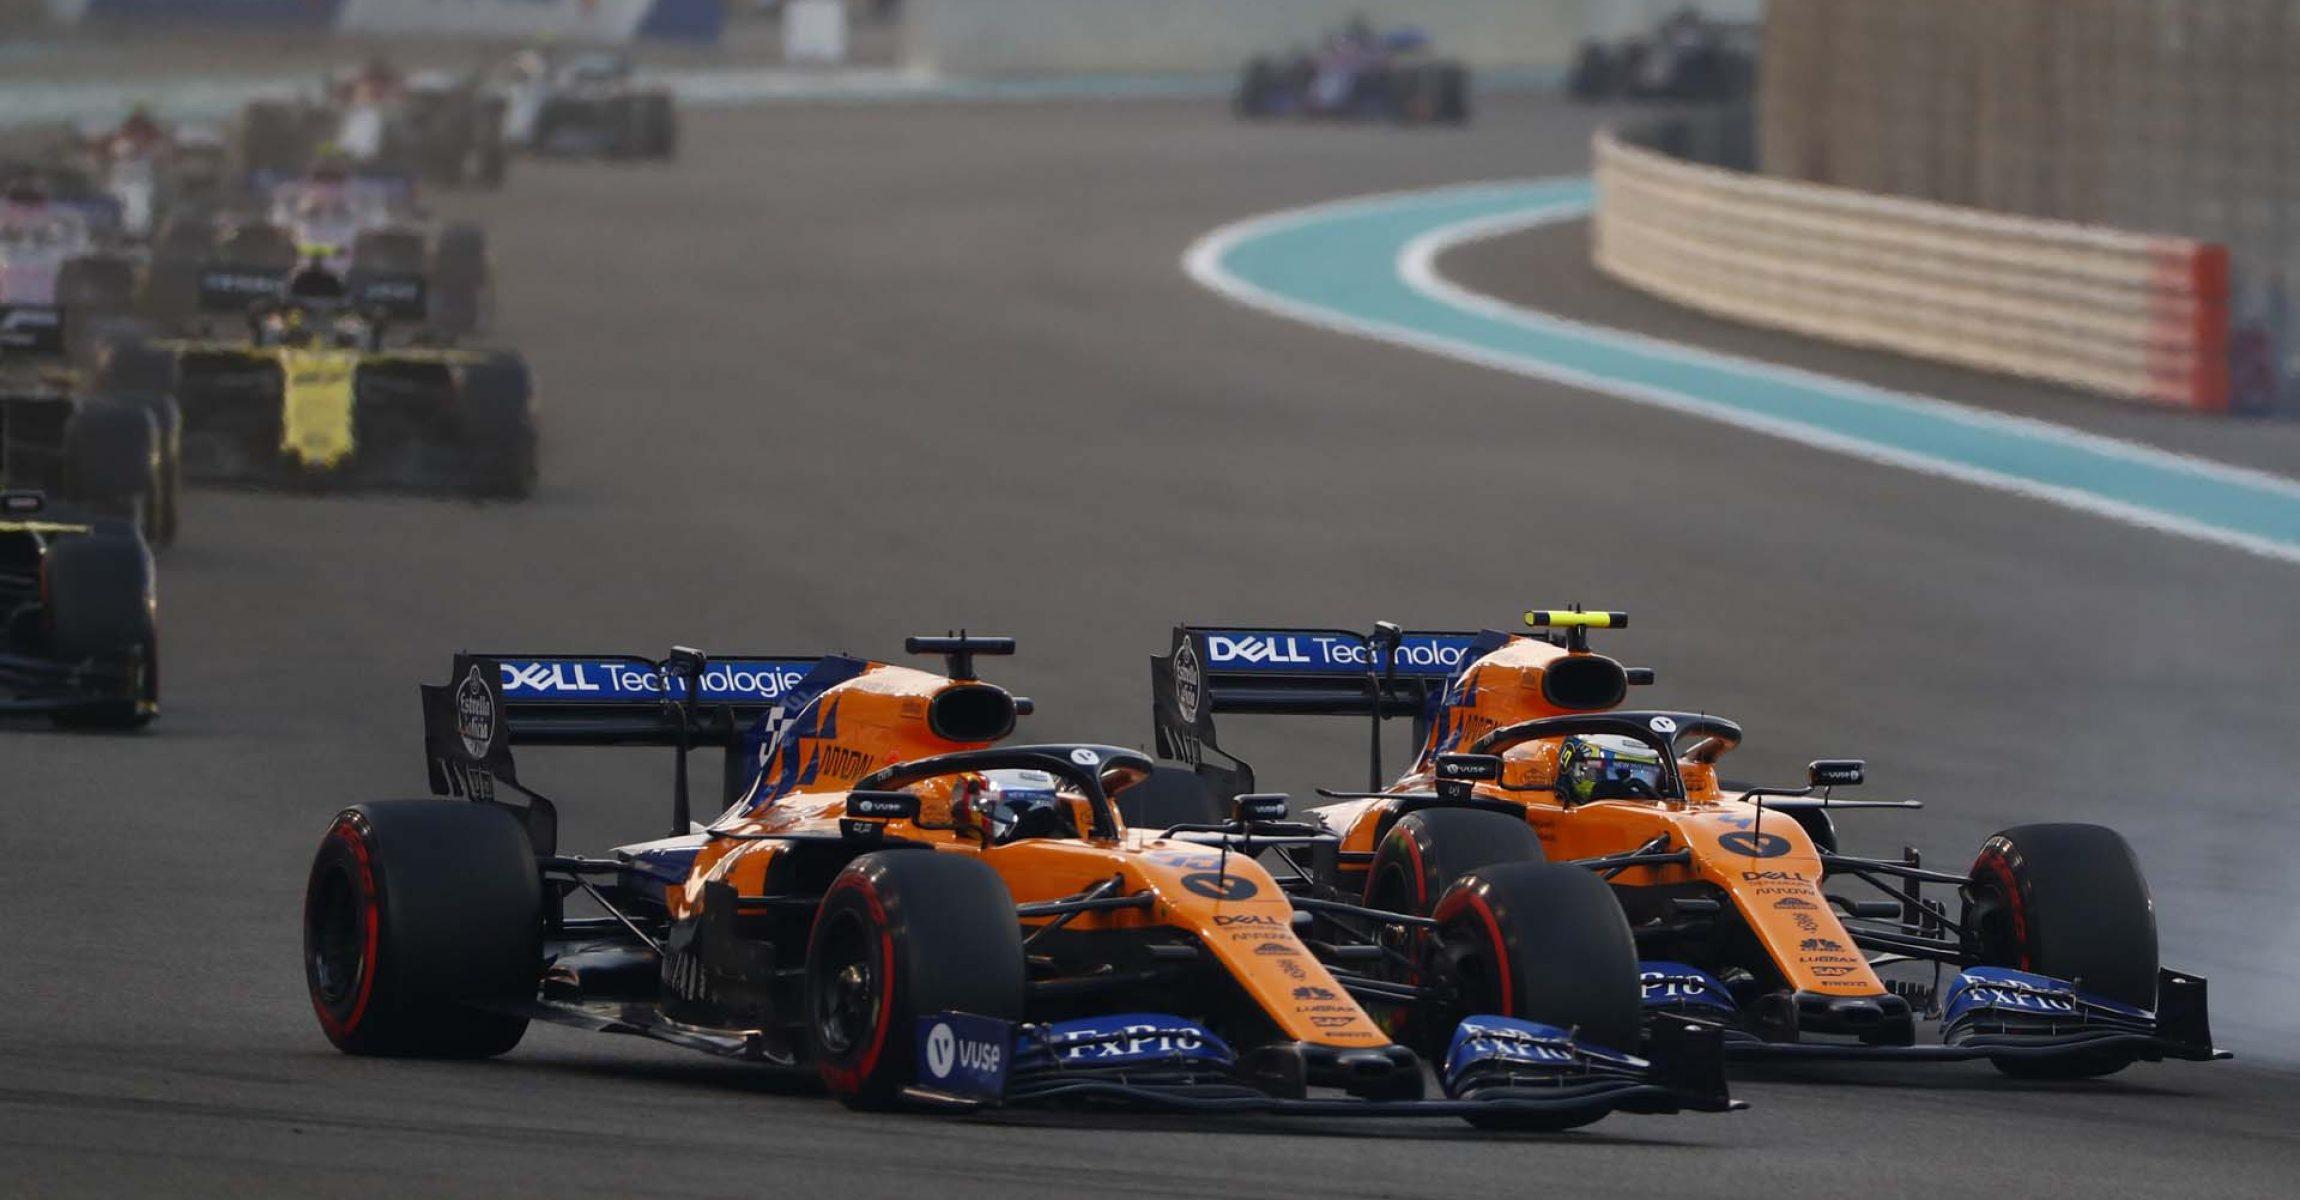 Carlos Sainz, McLaren MCL34 battles with Lando Norris, McLaren MCL34